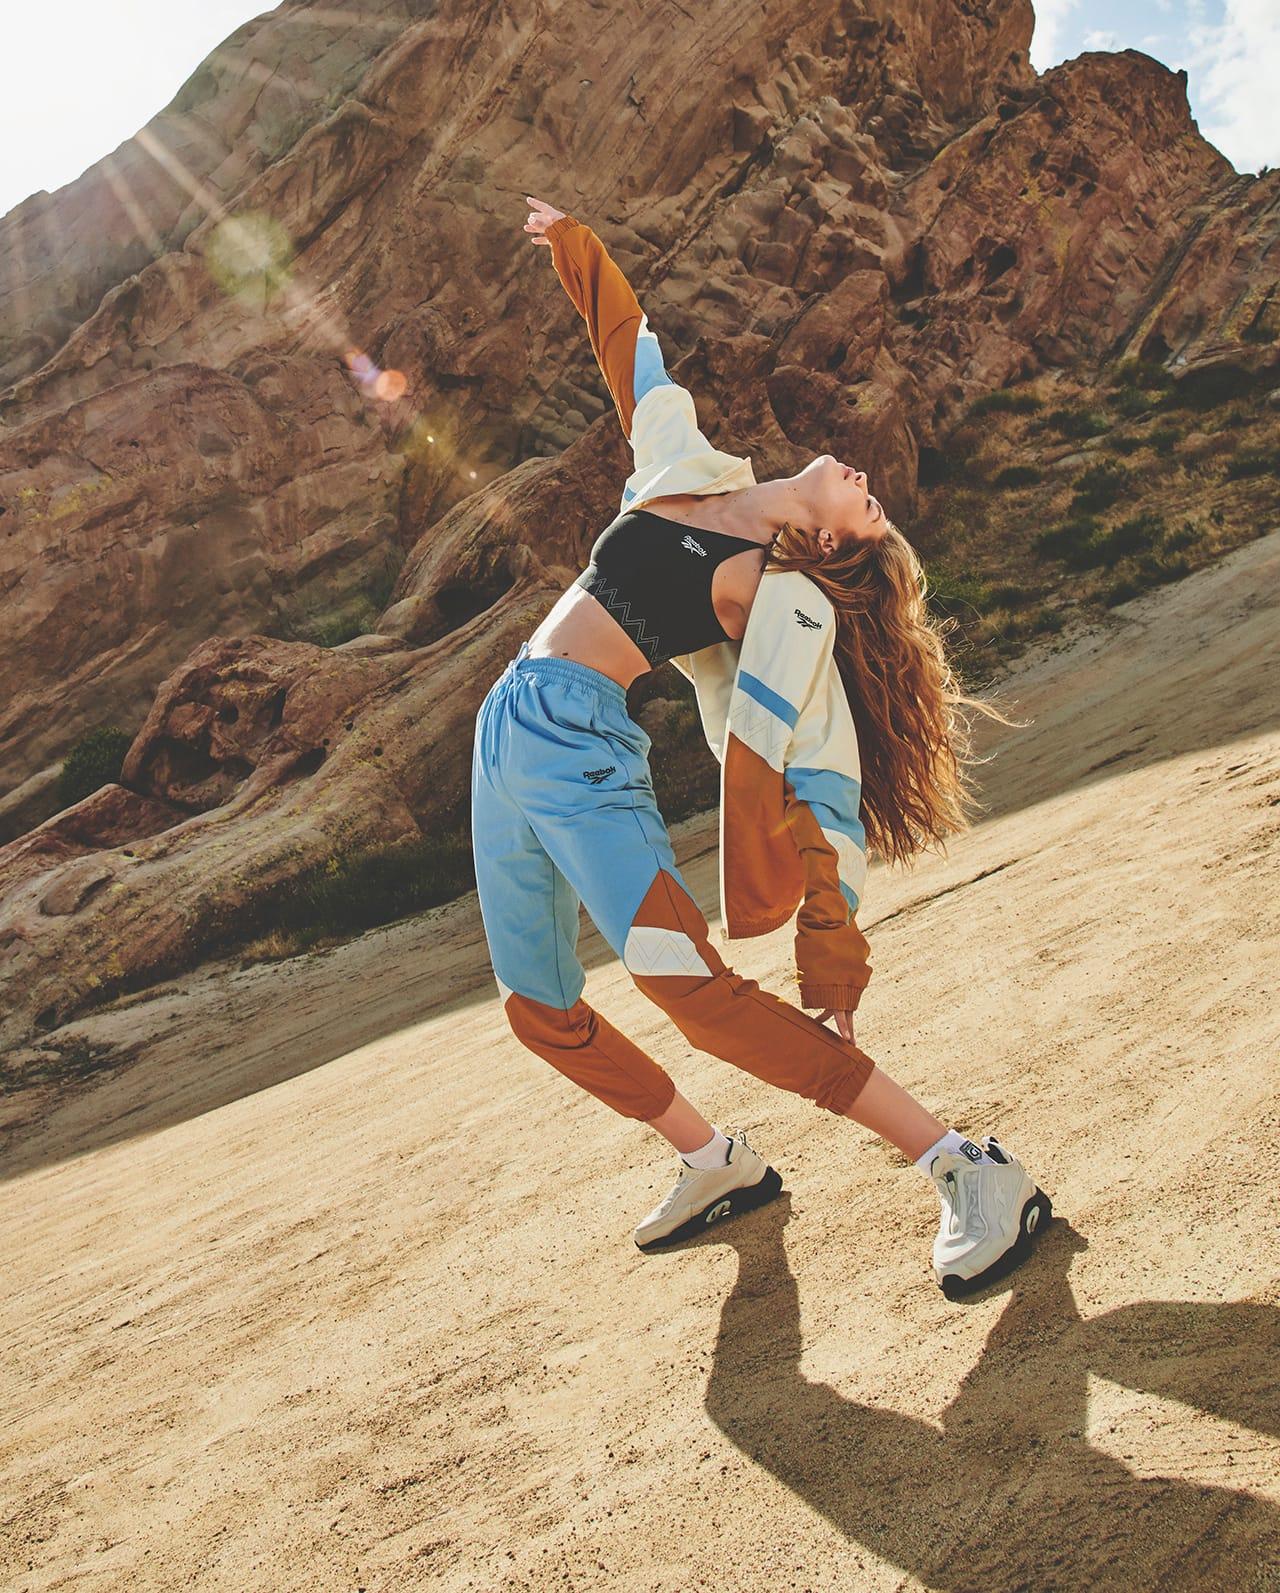 Gigi Hadid x Reebok FW19 Sneaker